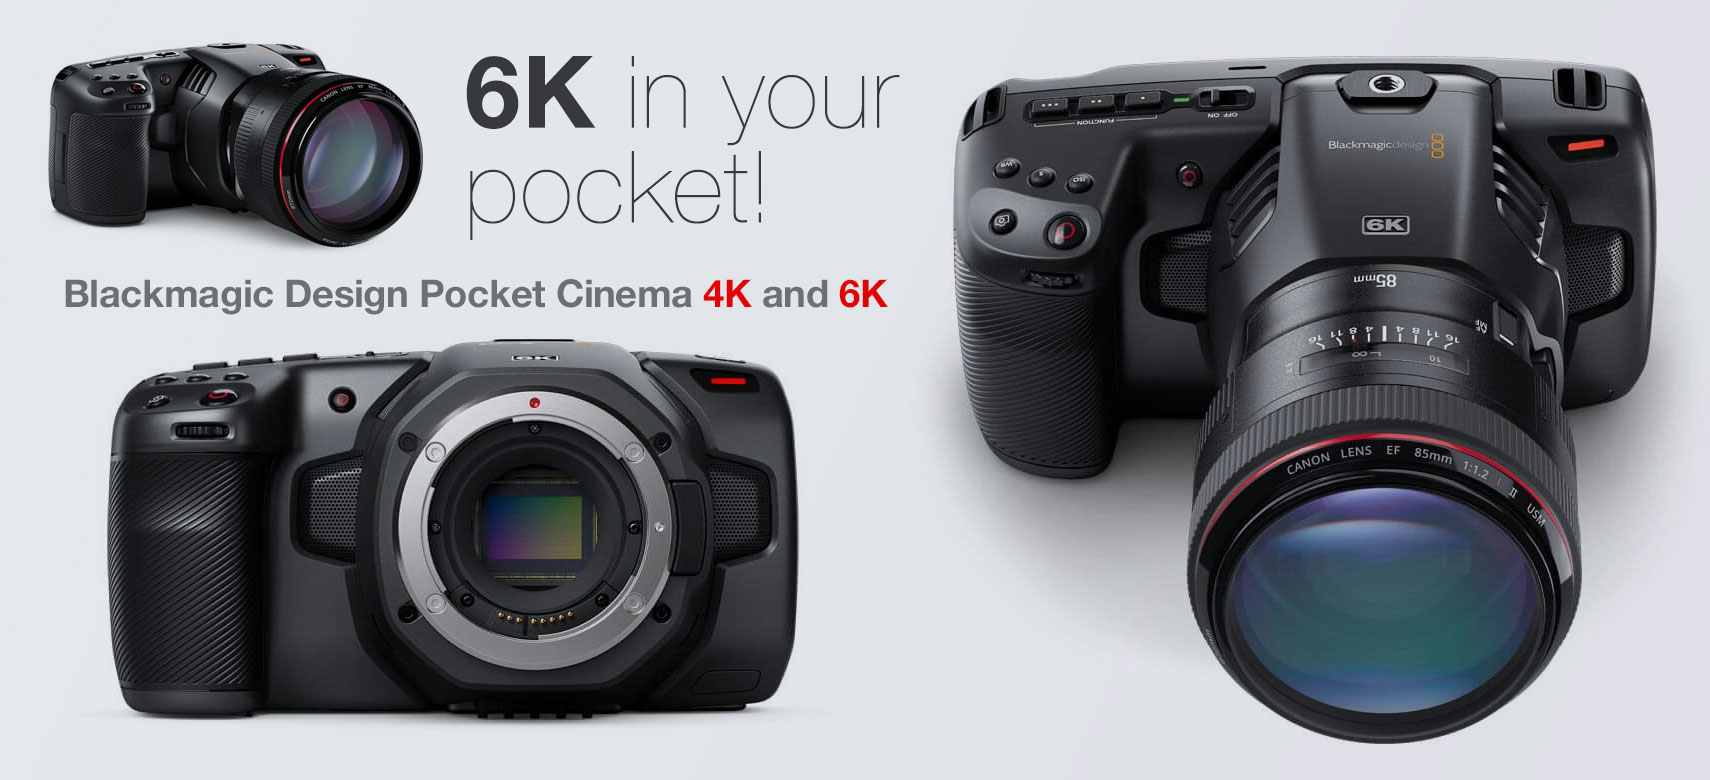 Blackmagic Pocket Cameras